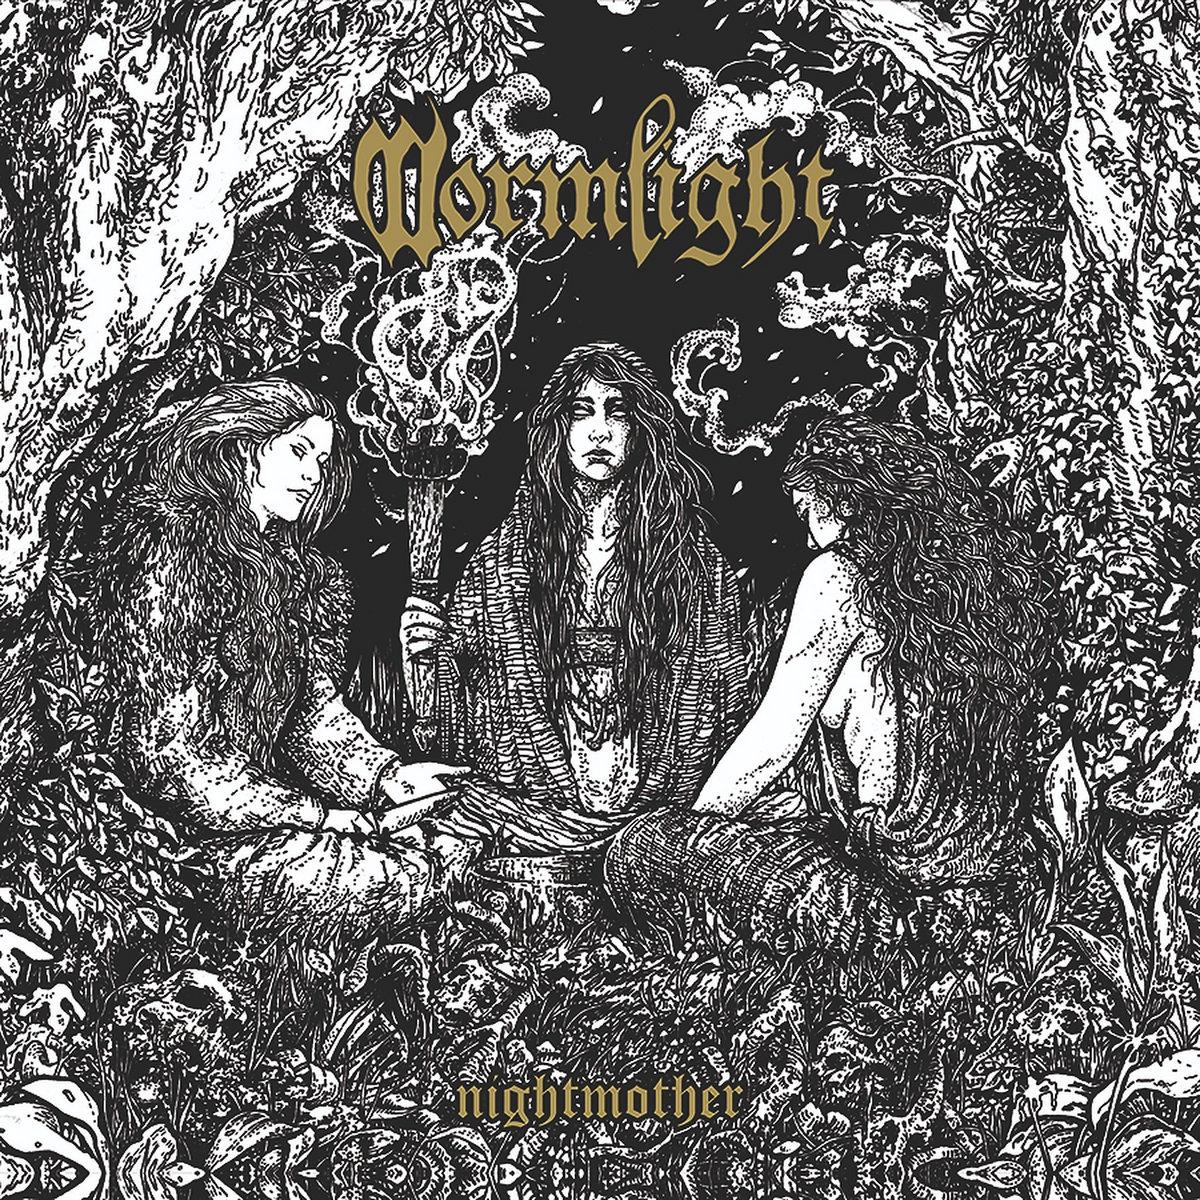 Wormlight : Nightmother